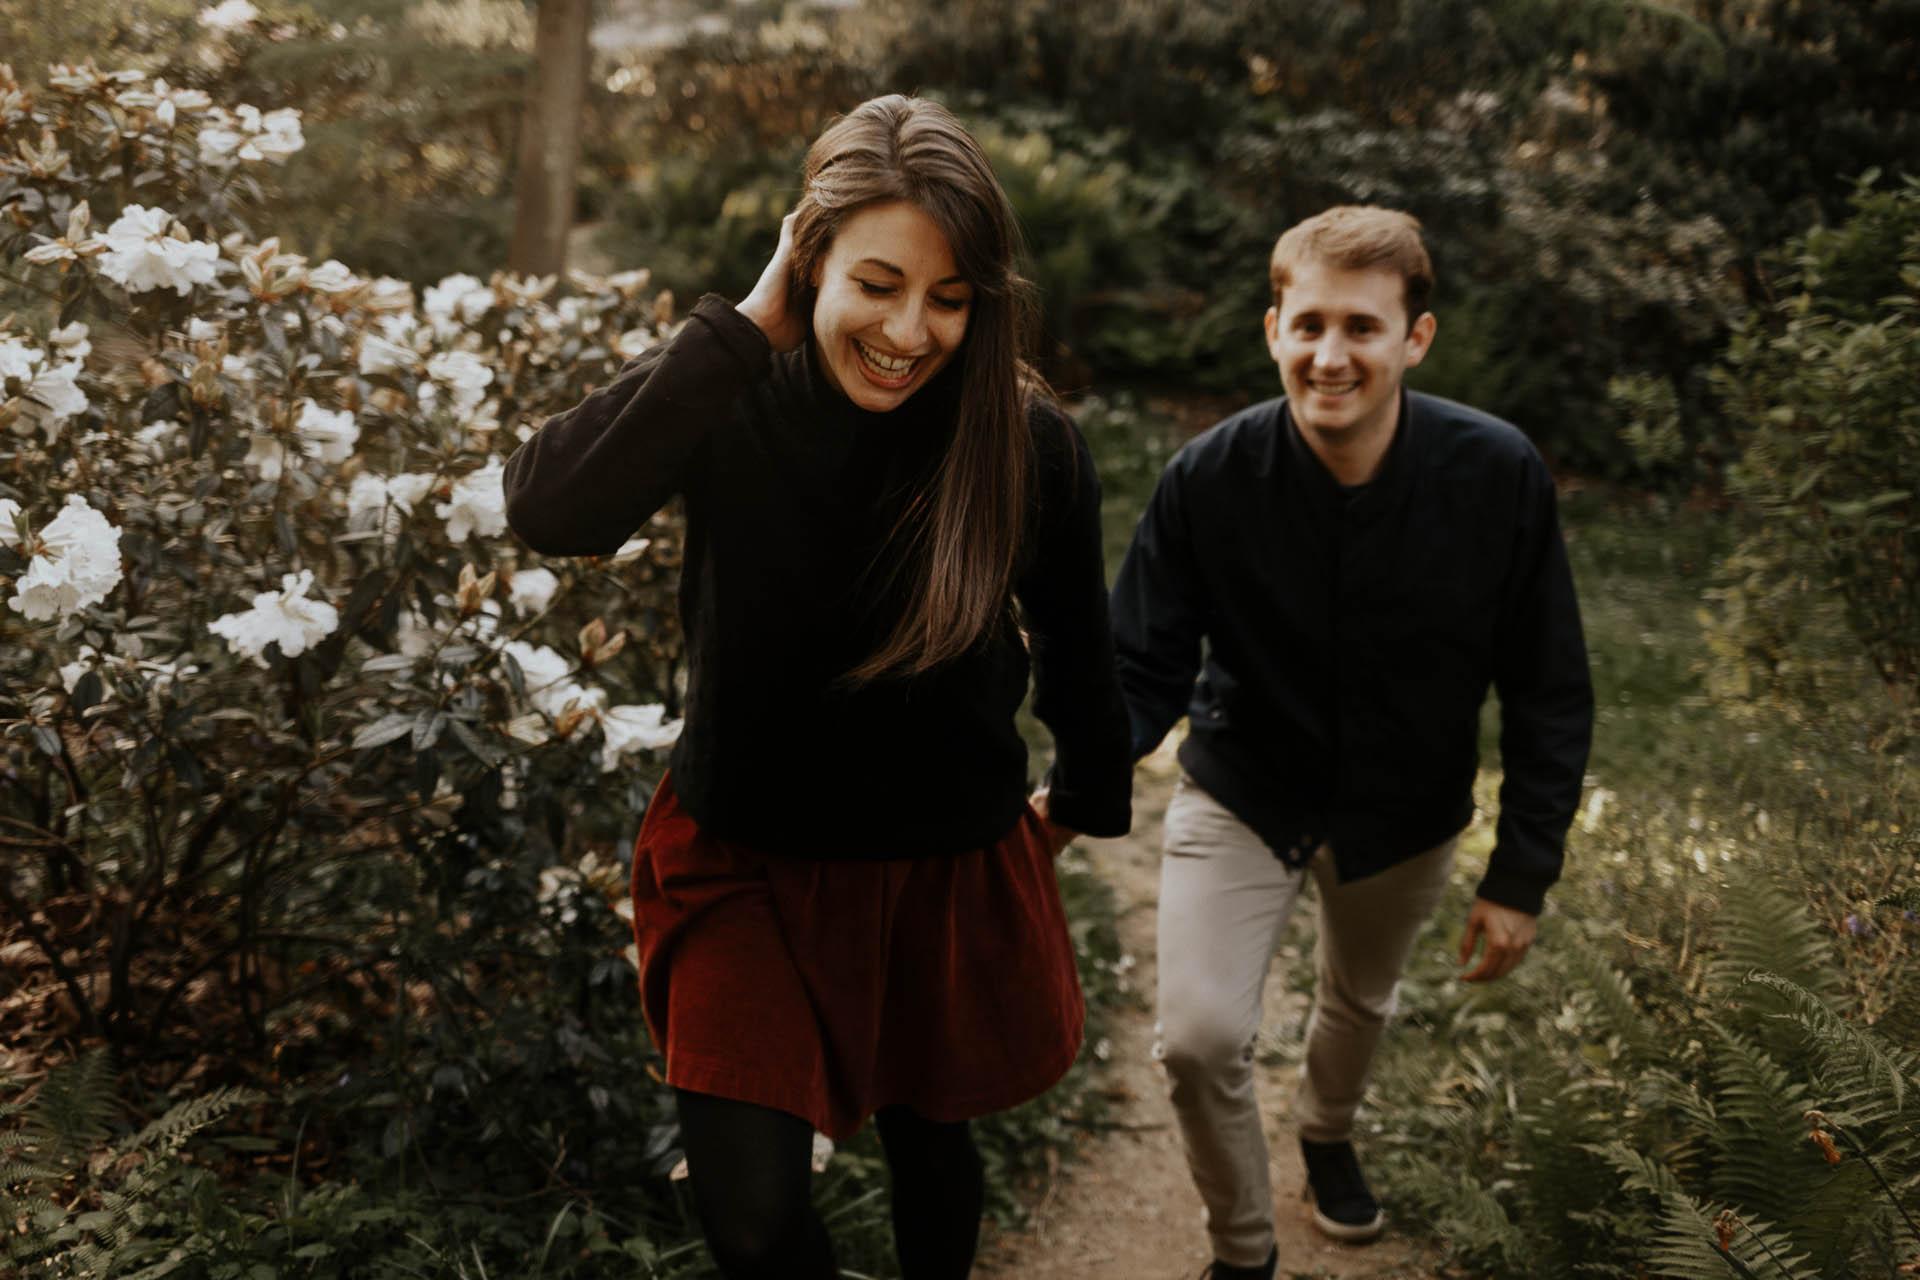 engagement_session_nantes_parc_flavie_nelly_photographe_mariage-44